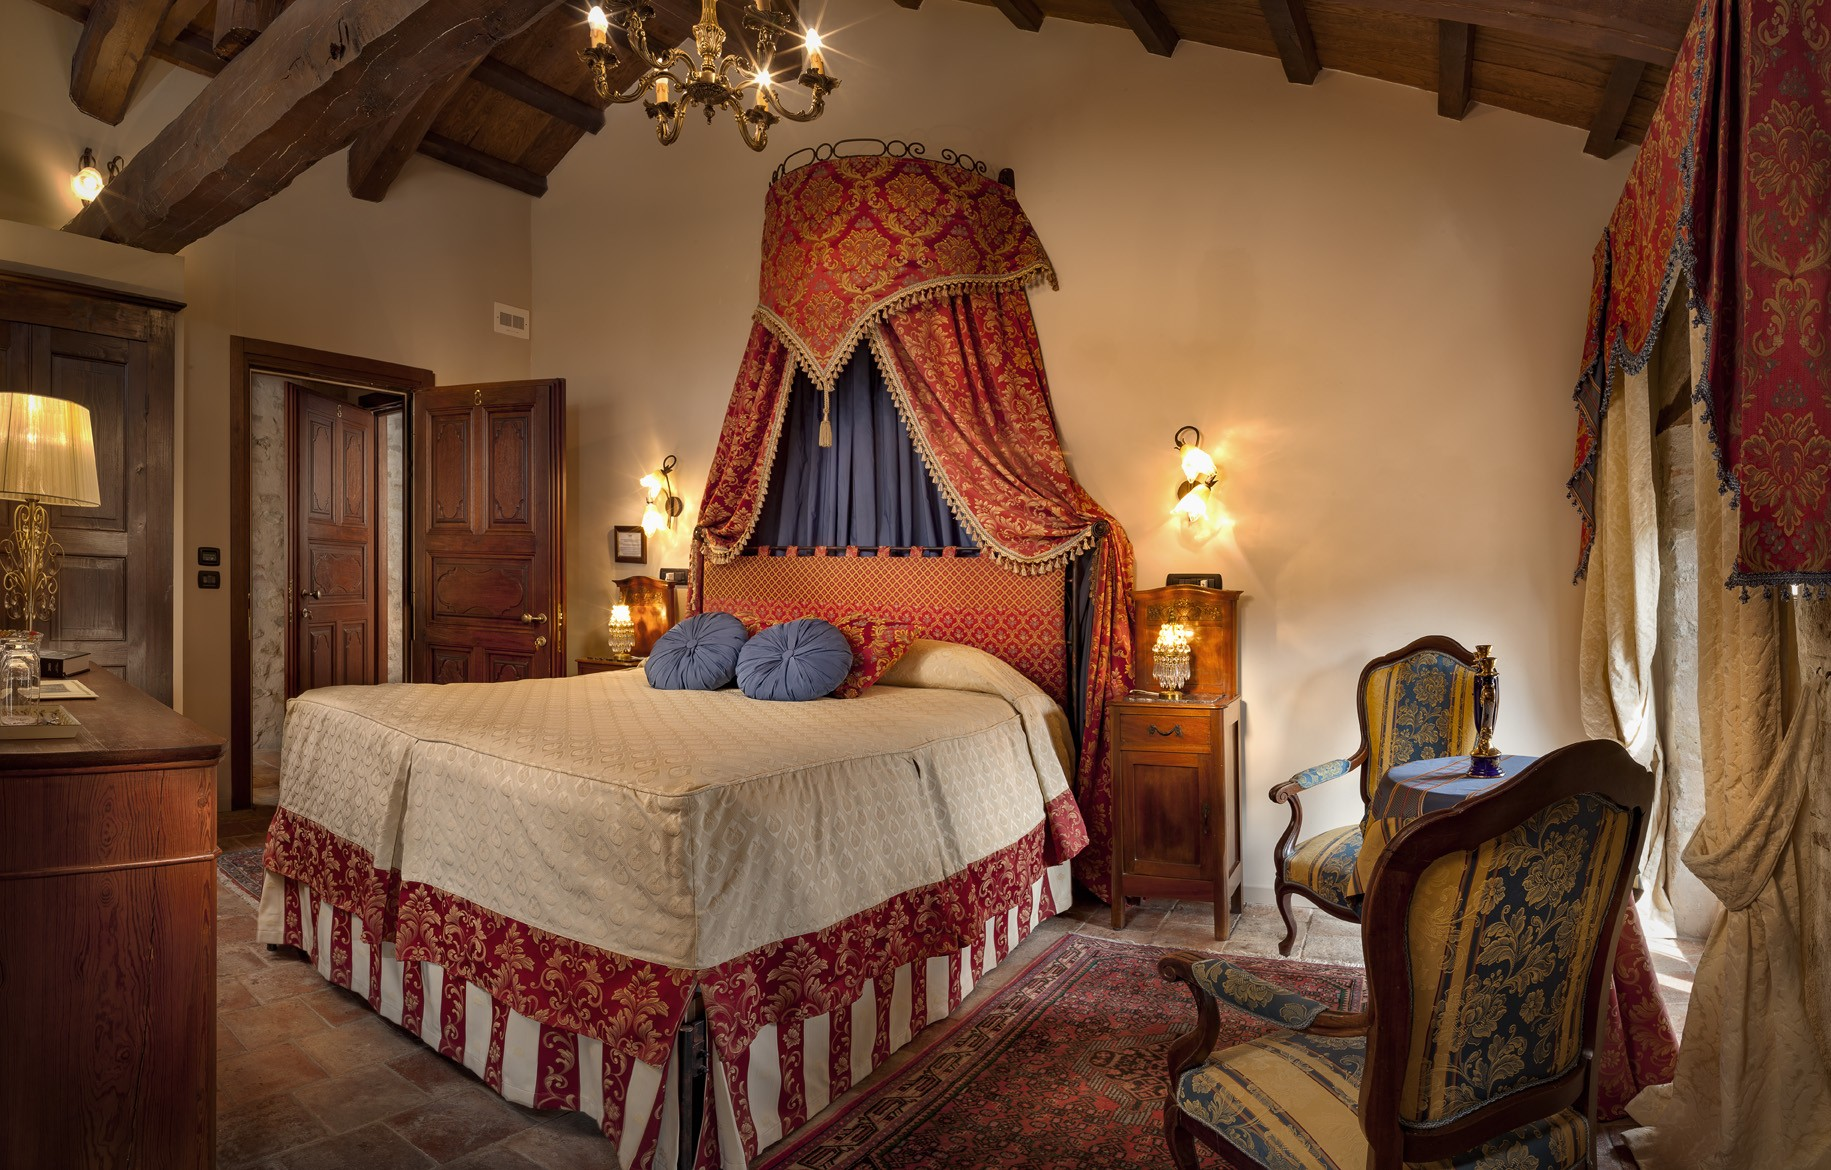 La Dolce Vigna - Sinio - Room - 3.jpeg